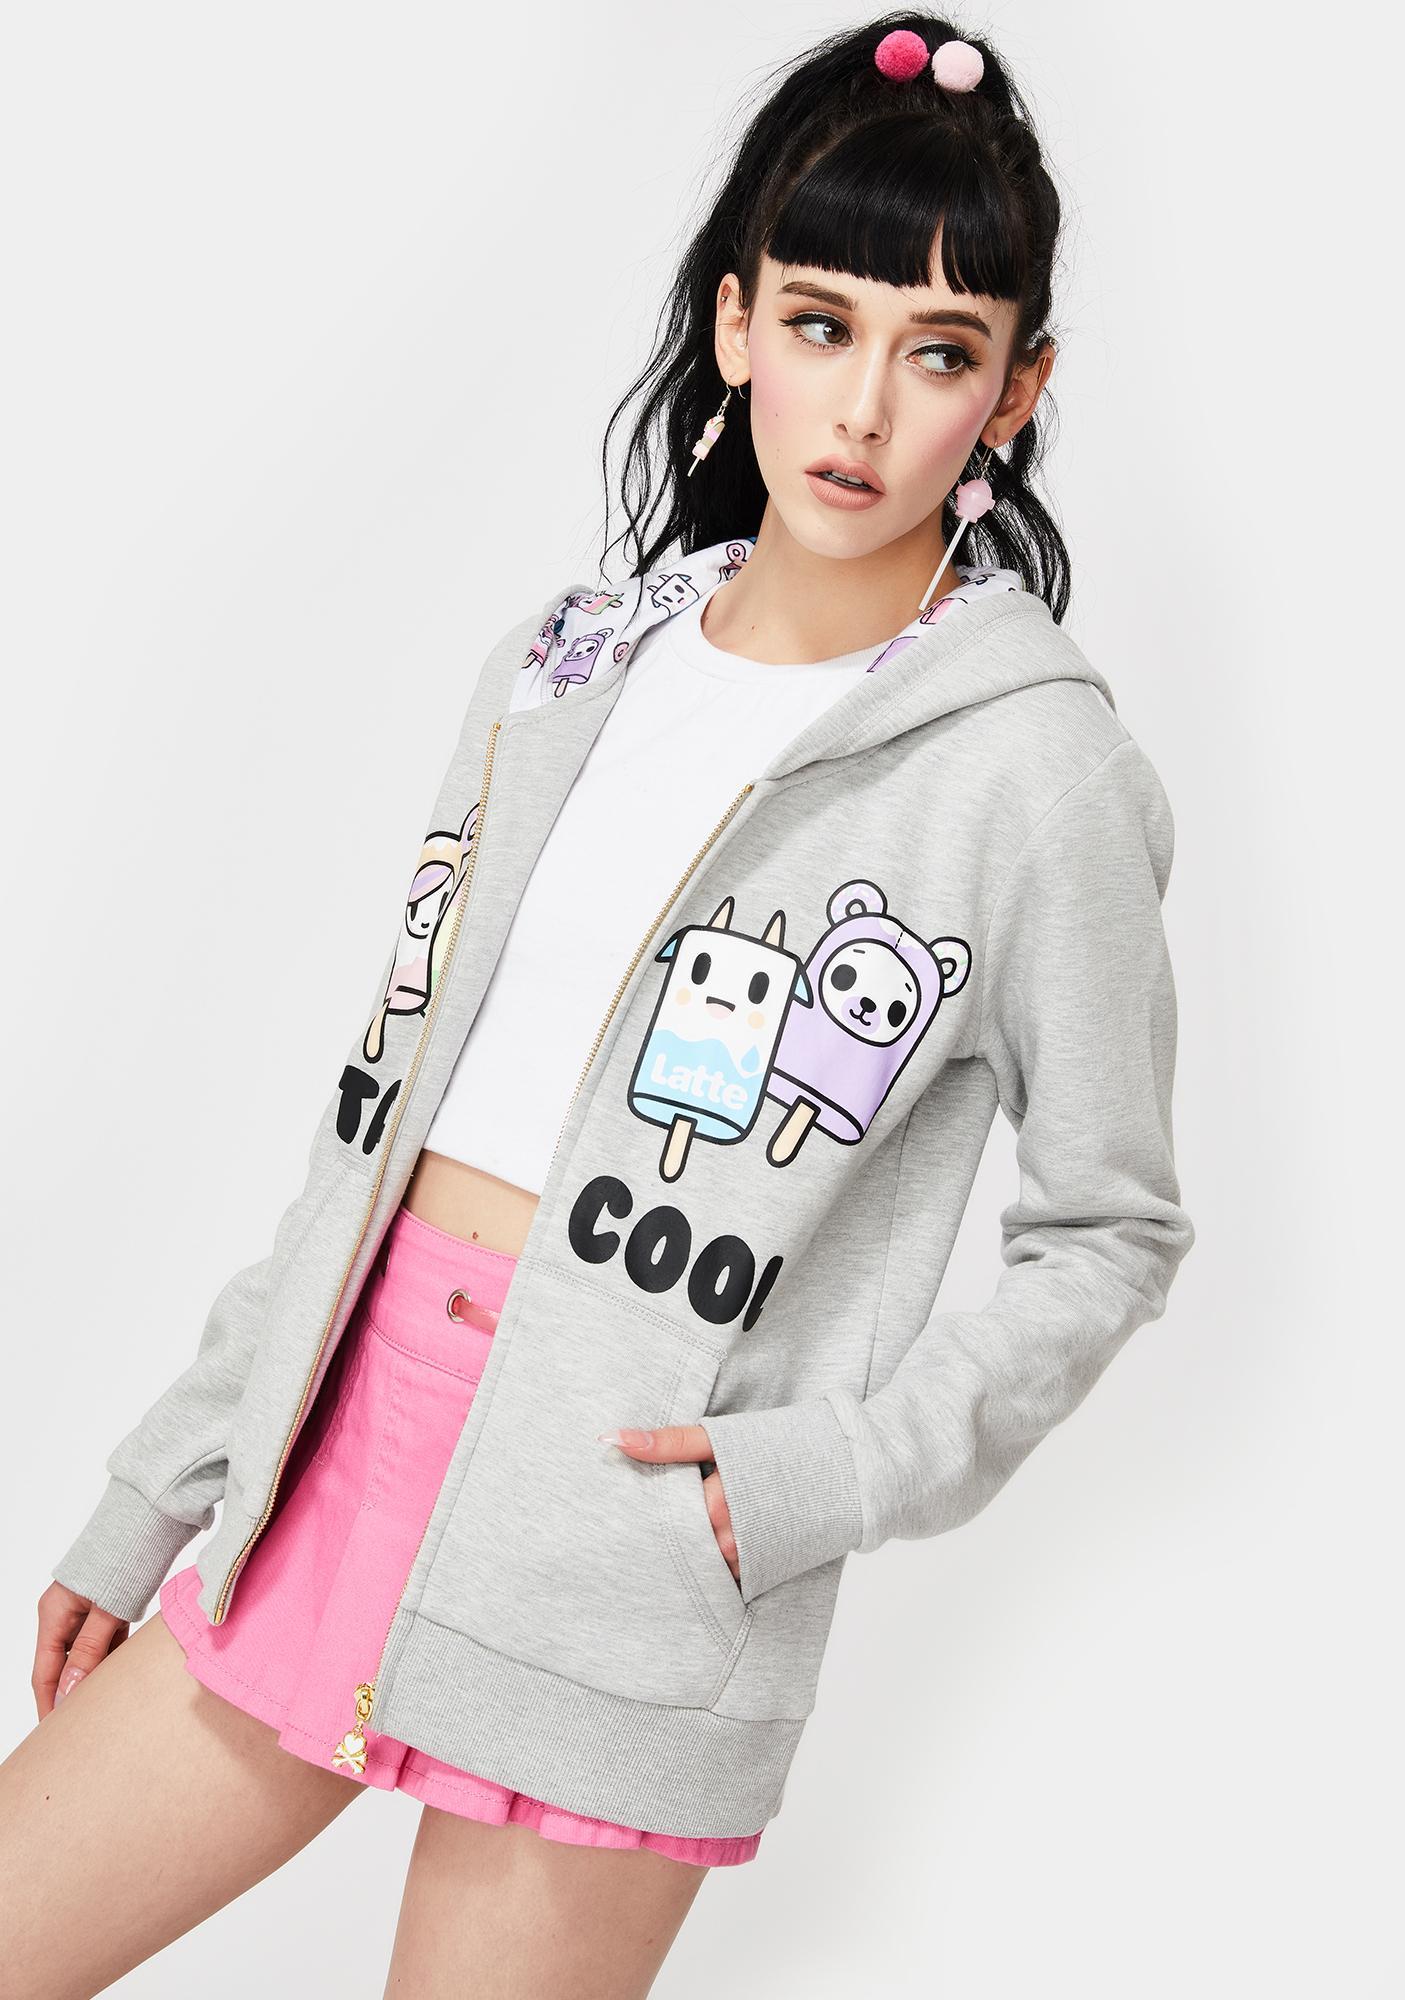 Tokidoki Stay Cool Zip Up Hoodie